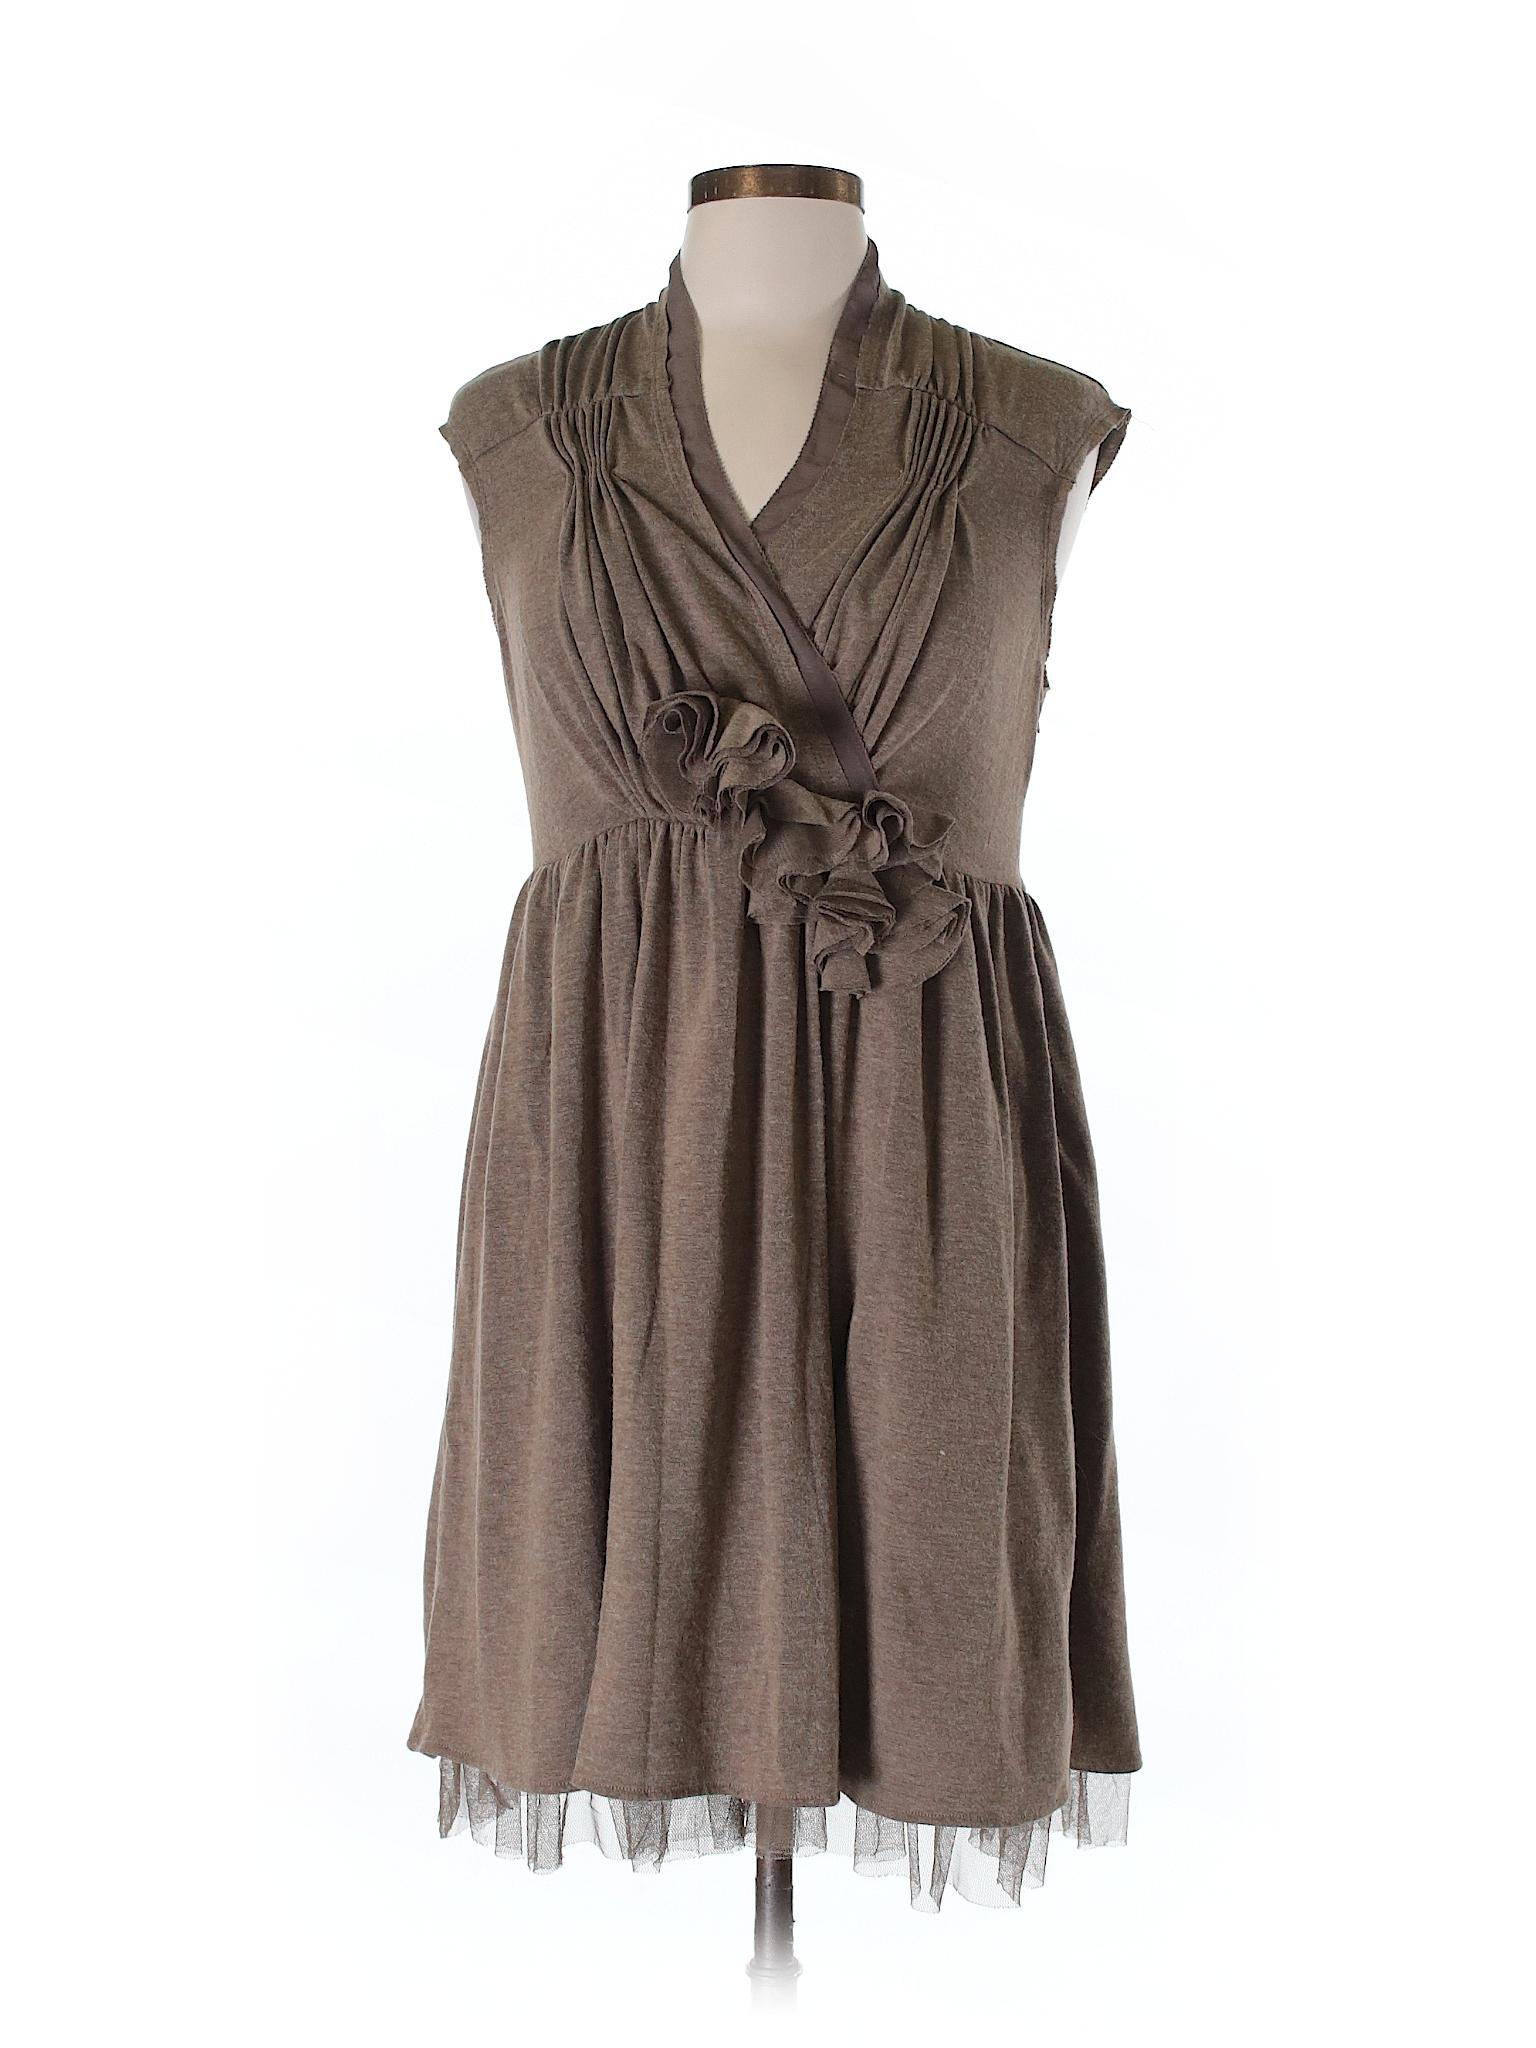 Ryu Dress Ryu Selling Casual Dress Casual Selling Selling URHR1w